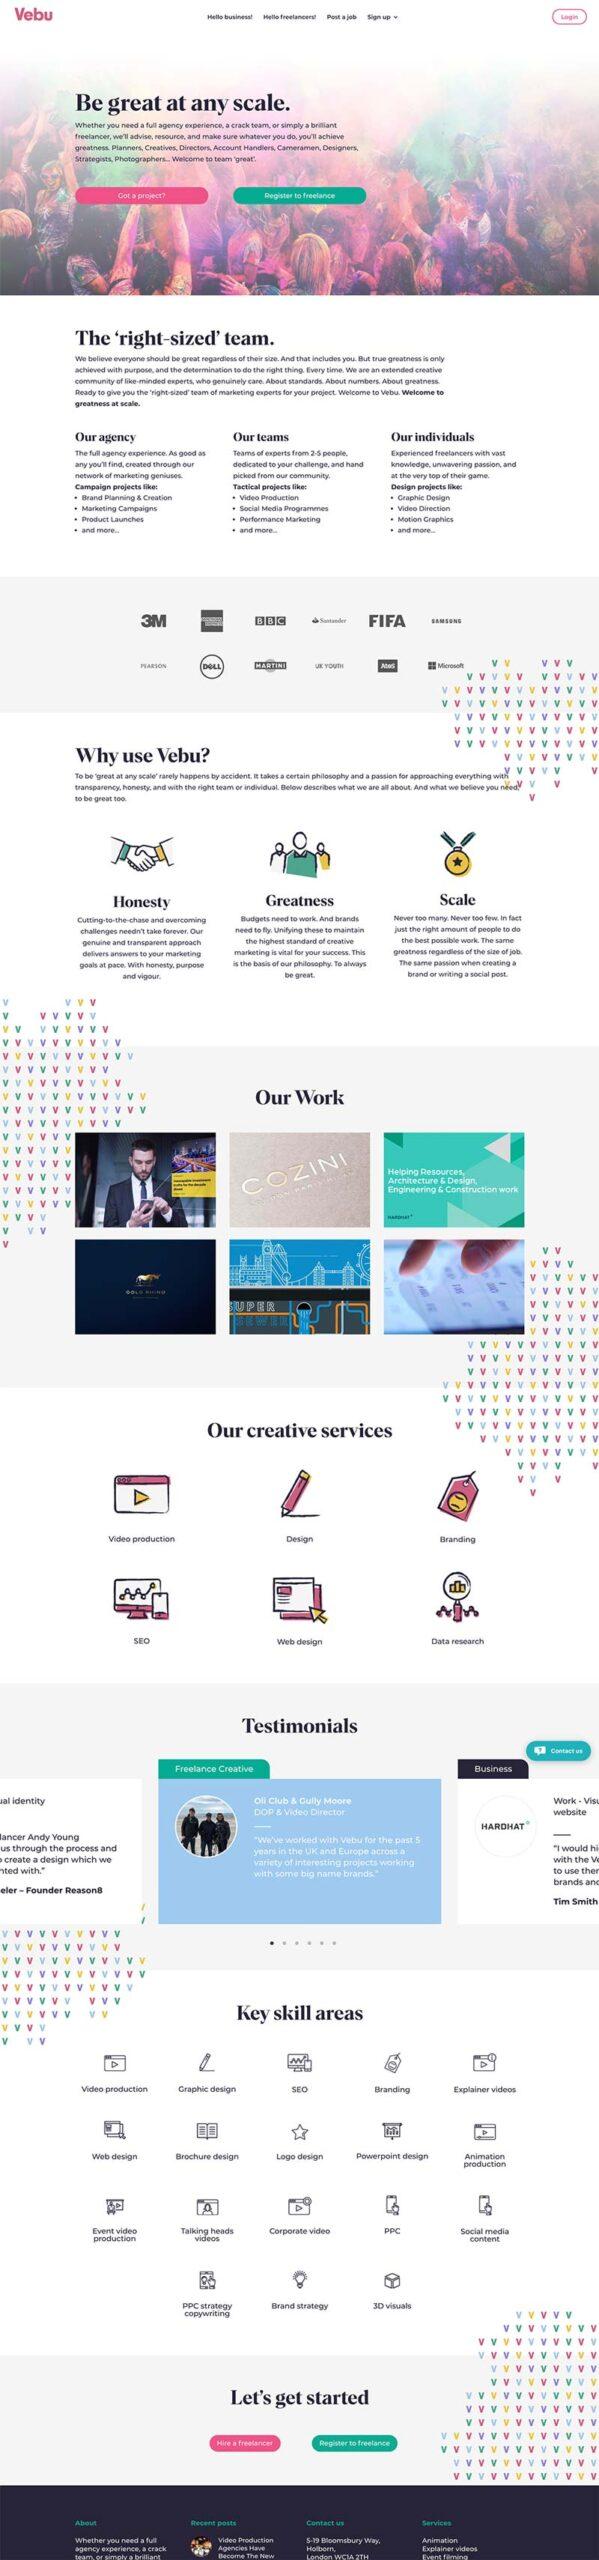 vebu.co.uk web development